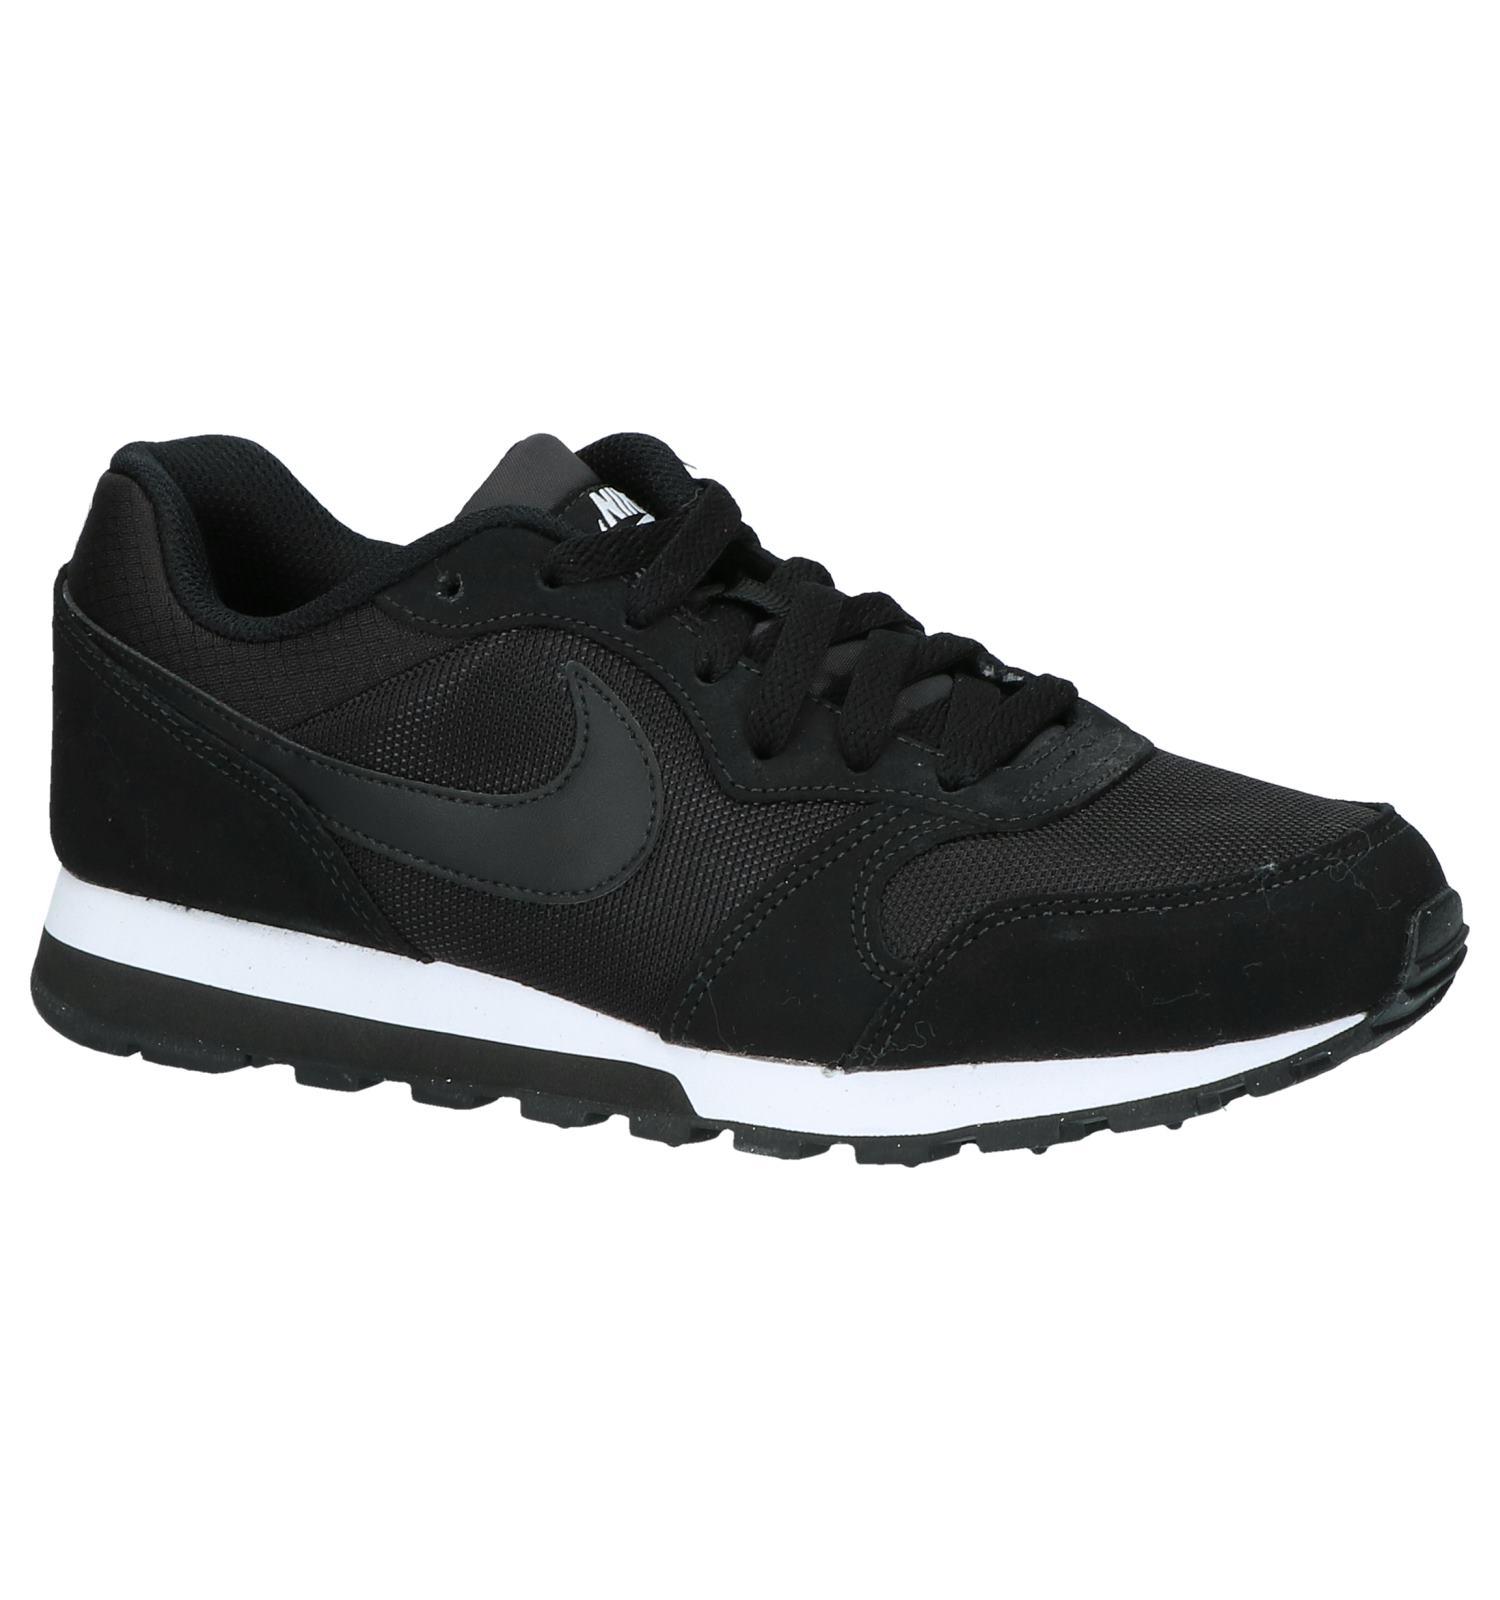 695ea99f82a Nike MD Runner 2 Lage Sneakers Zwart | TORFS.BE | Gratis verzend en retour